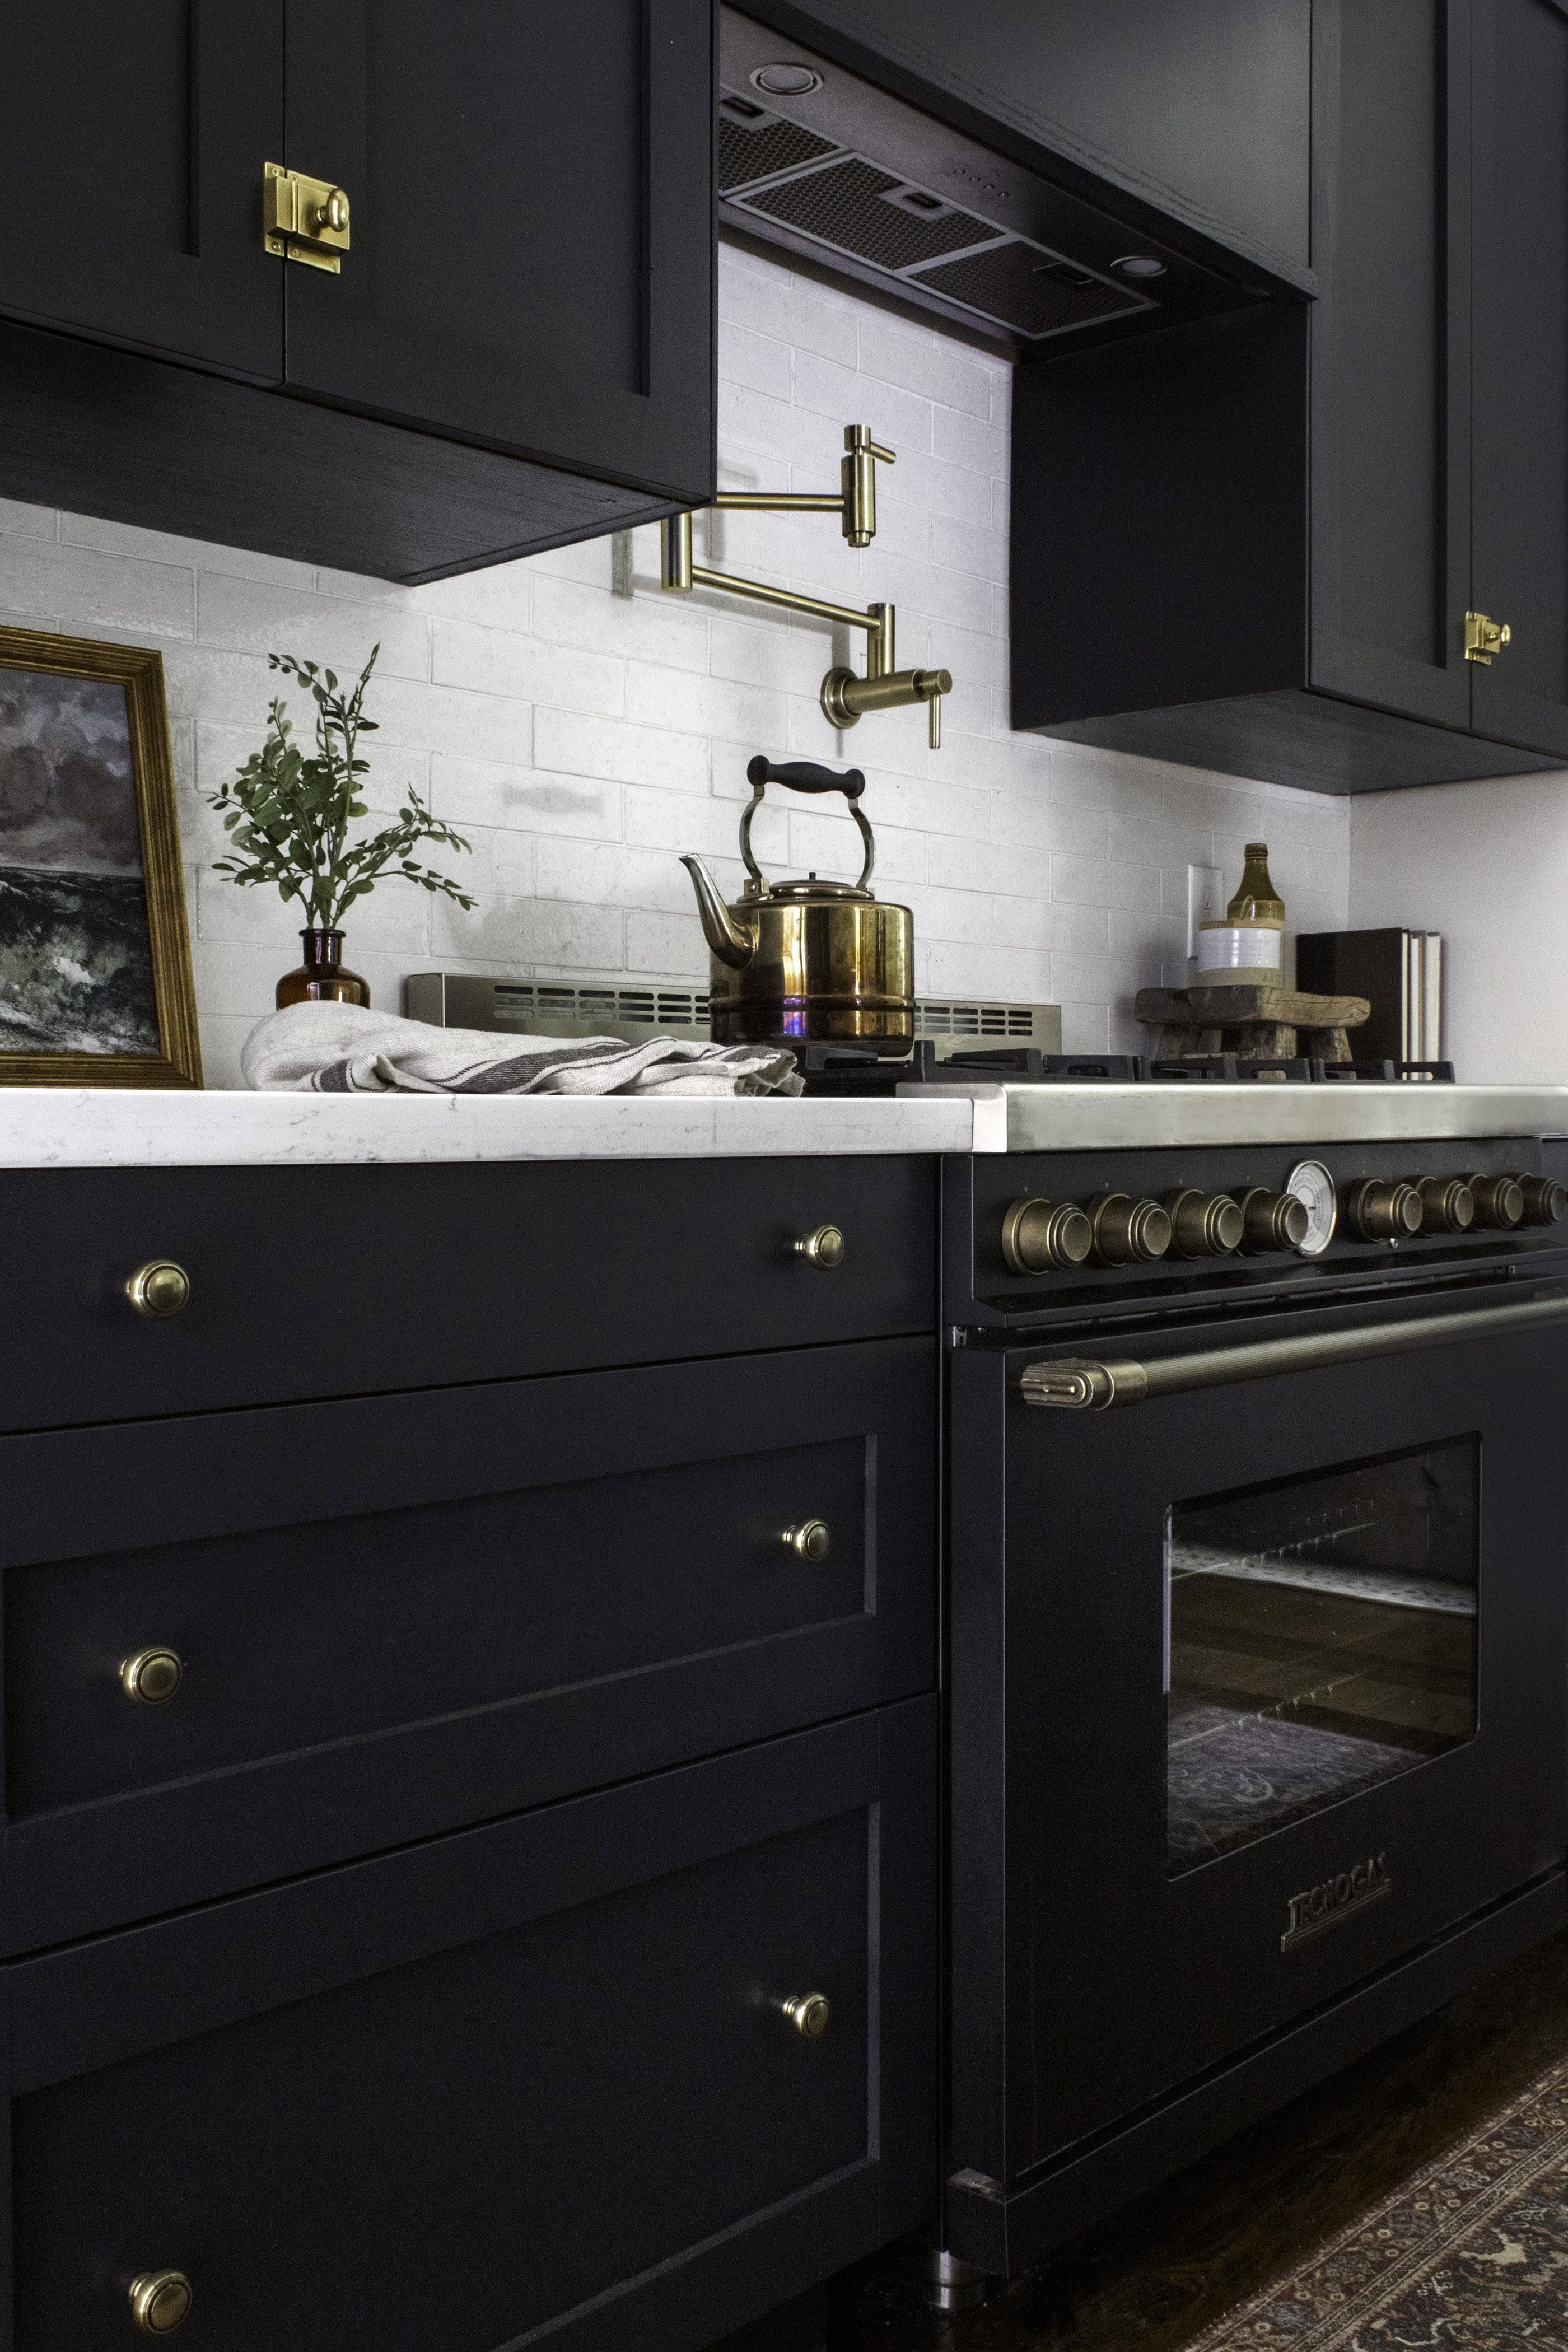 Brass Accents And Ebony Doors Make For A Darkly Dramatic Kitchen Victorian Kitchen Kitchen Cabinets Kitchen Design